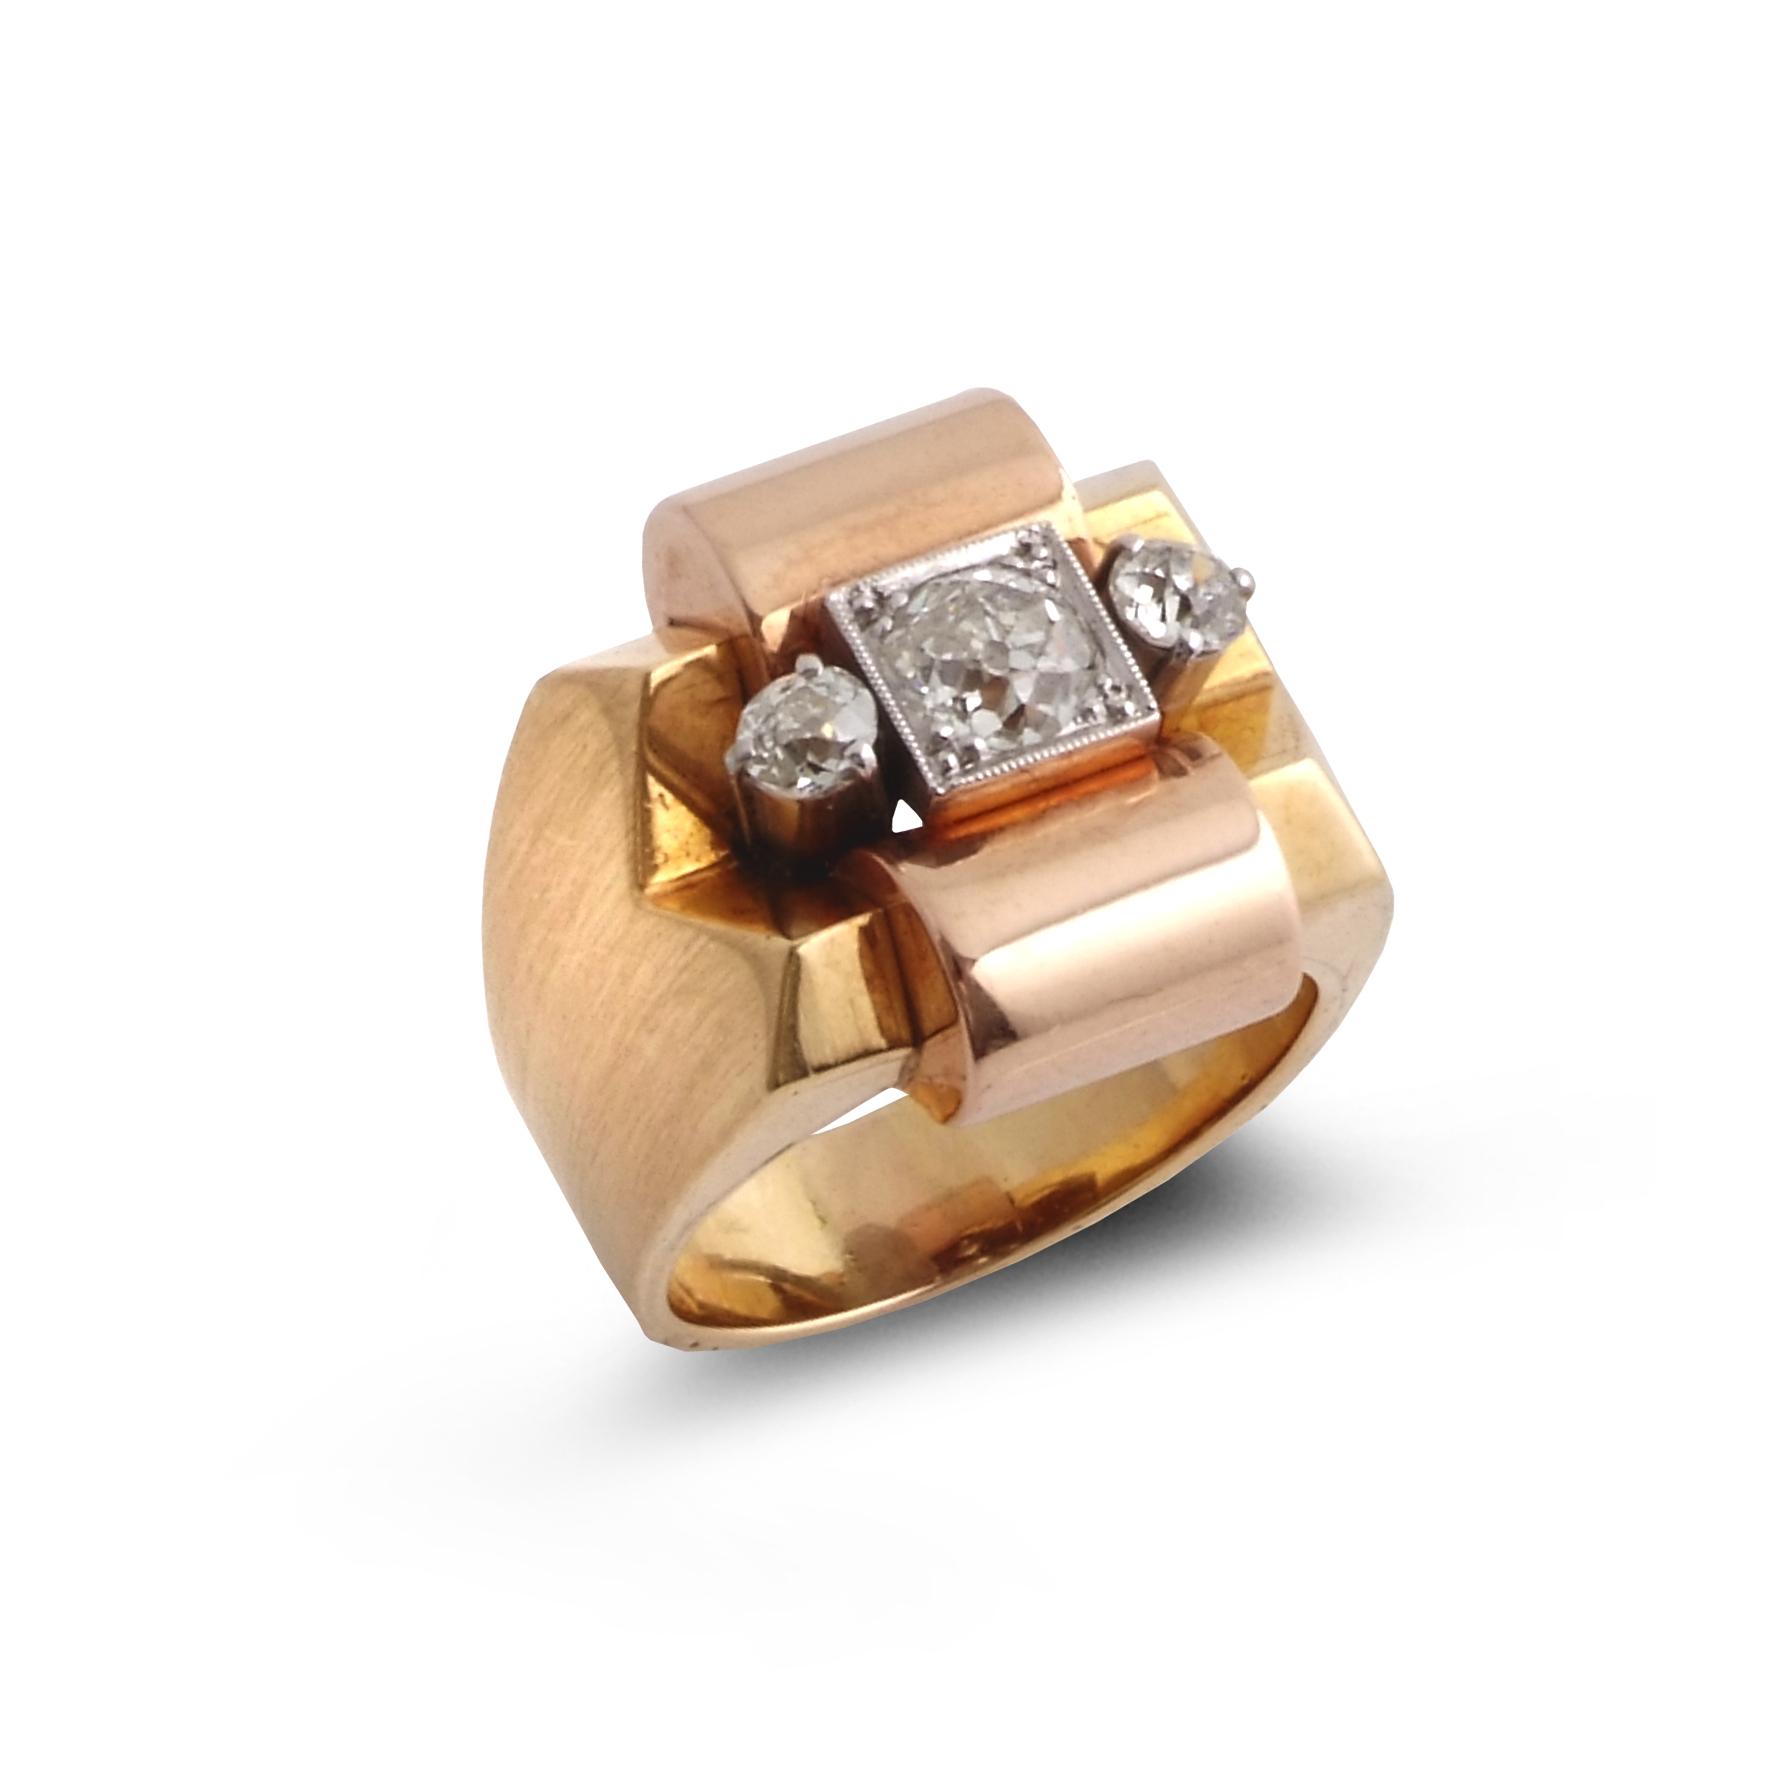 1950s three-stone diamond geometric ring